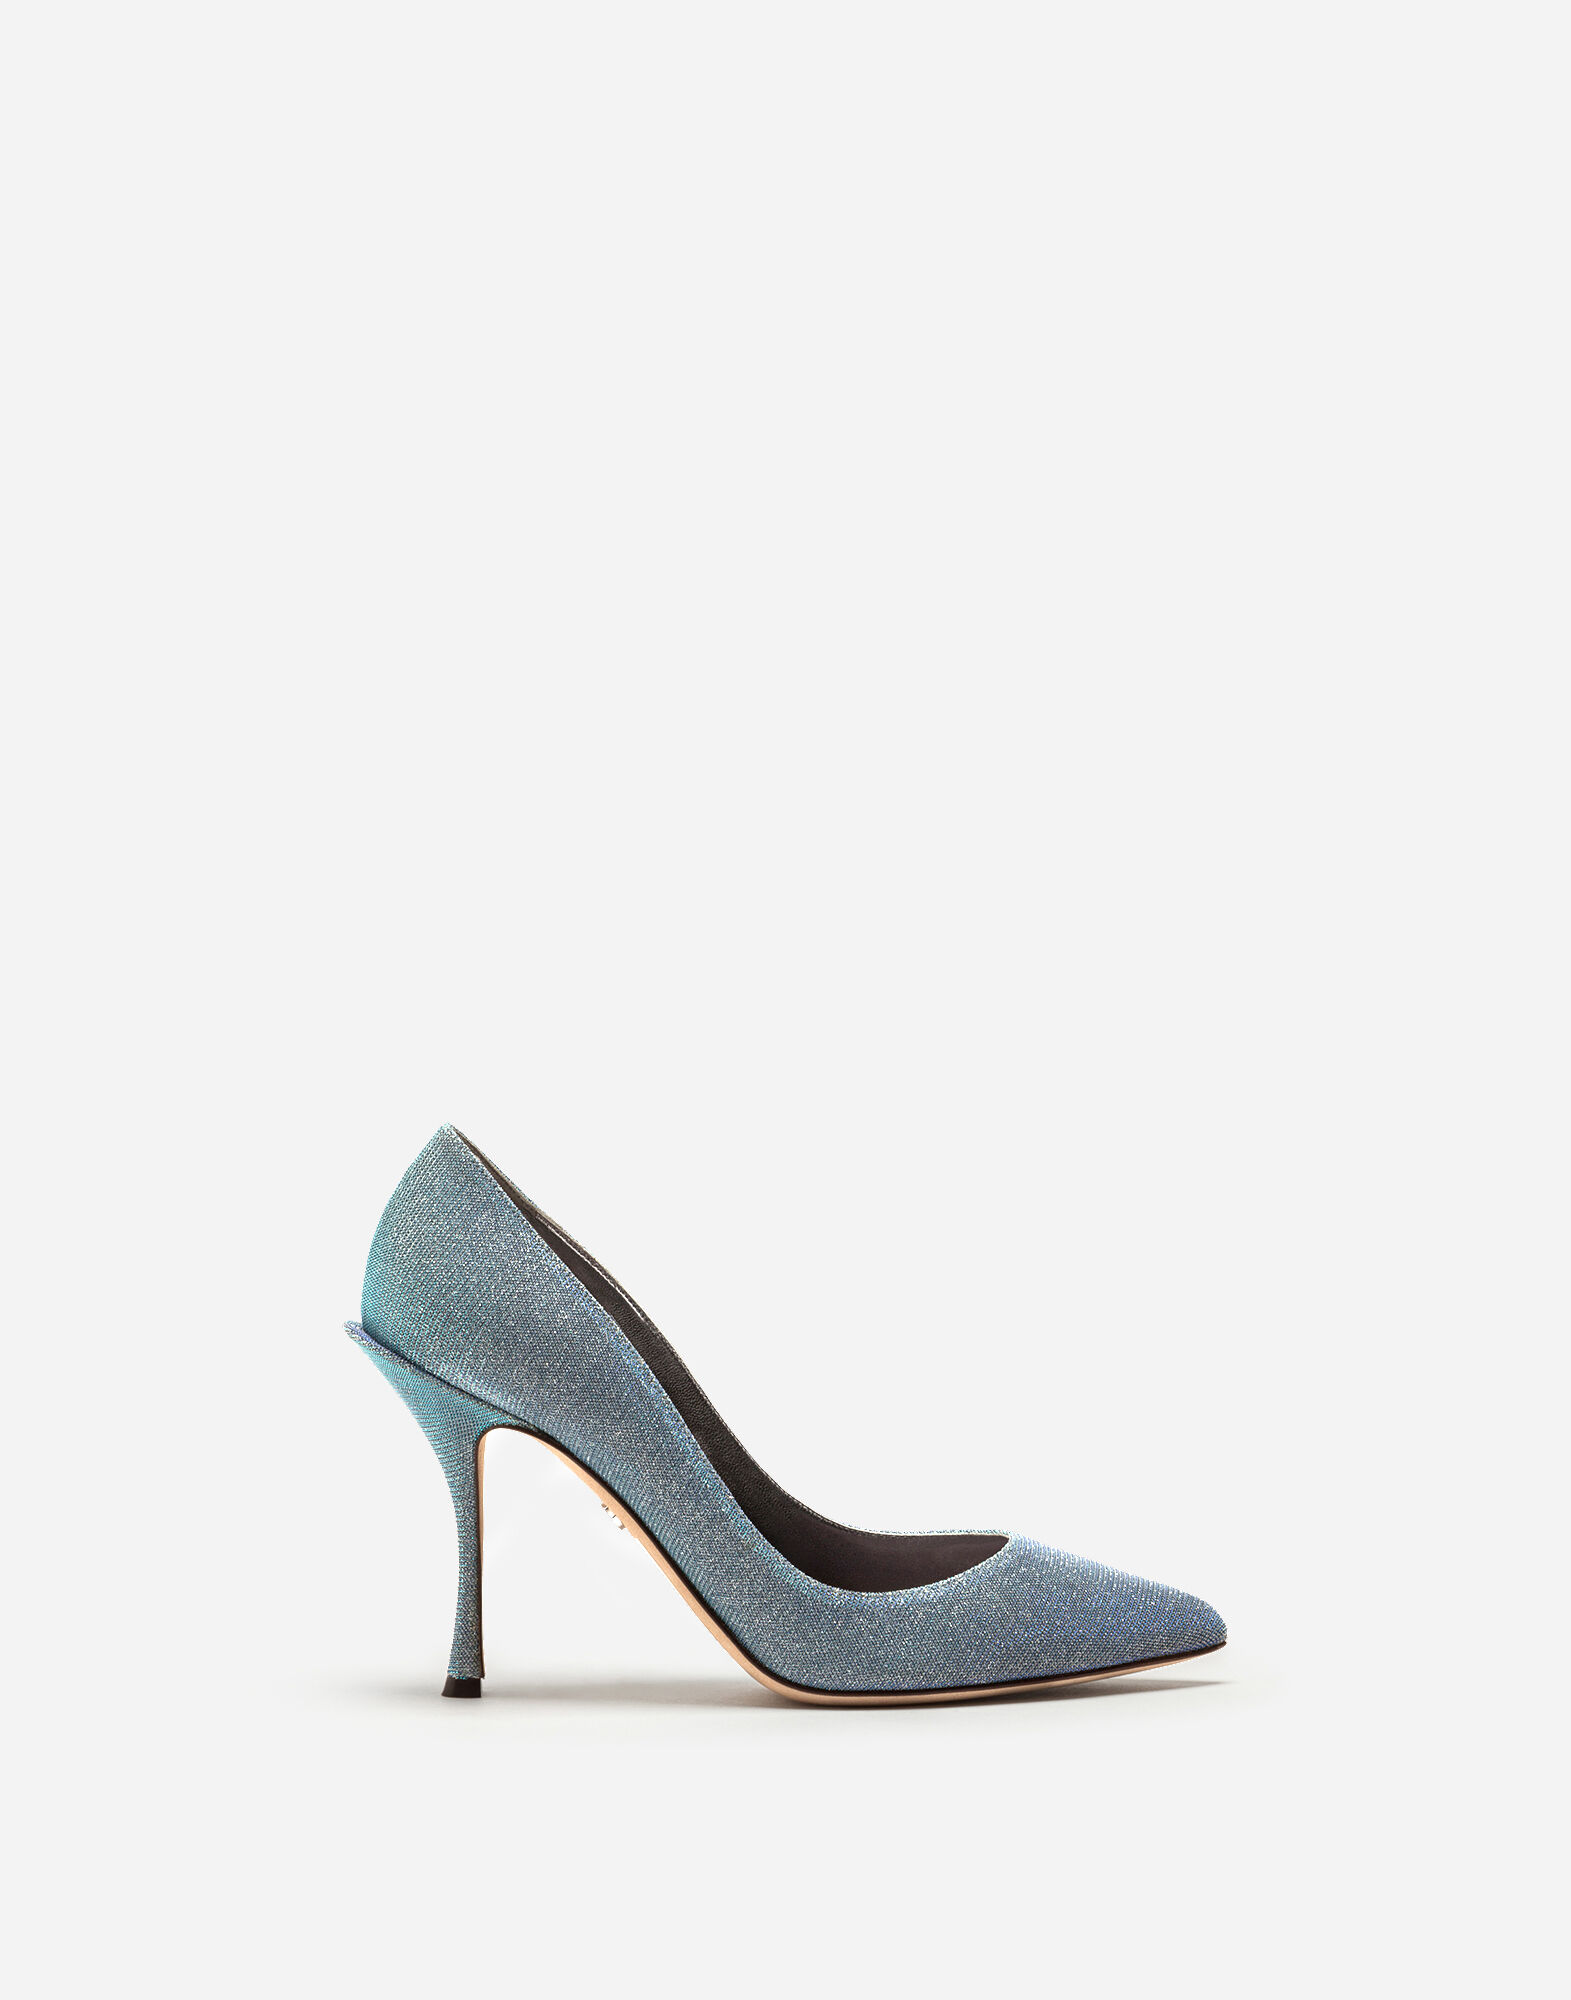 recommend for sale clearance extremely D&G Denim T-Strap Sandals explore sale online marketable cheap online hX8kr